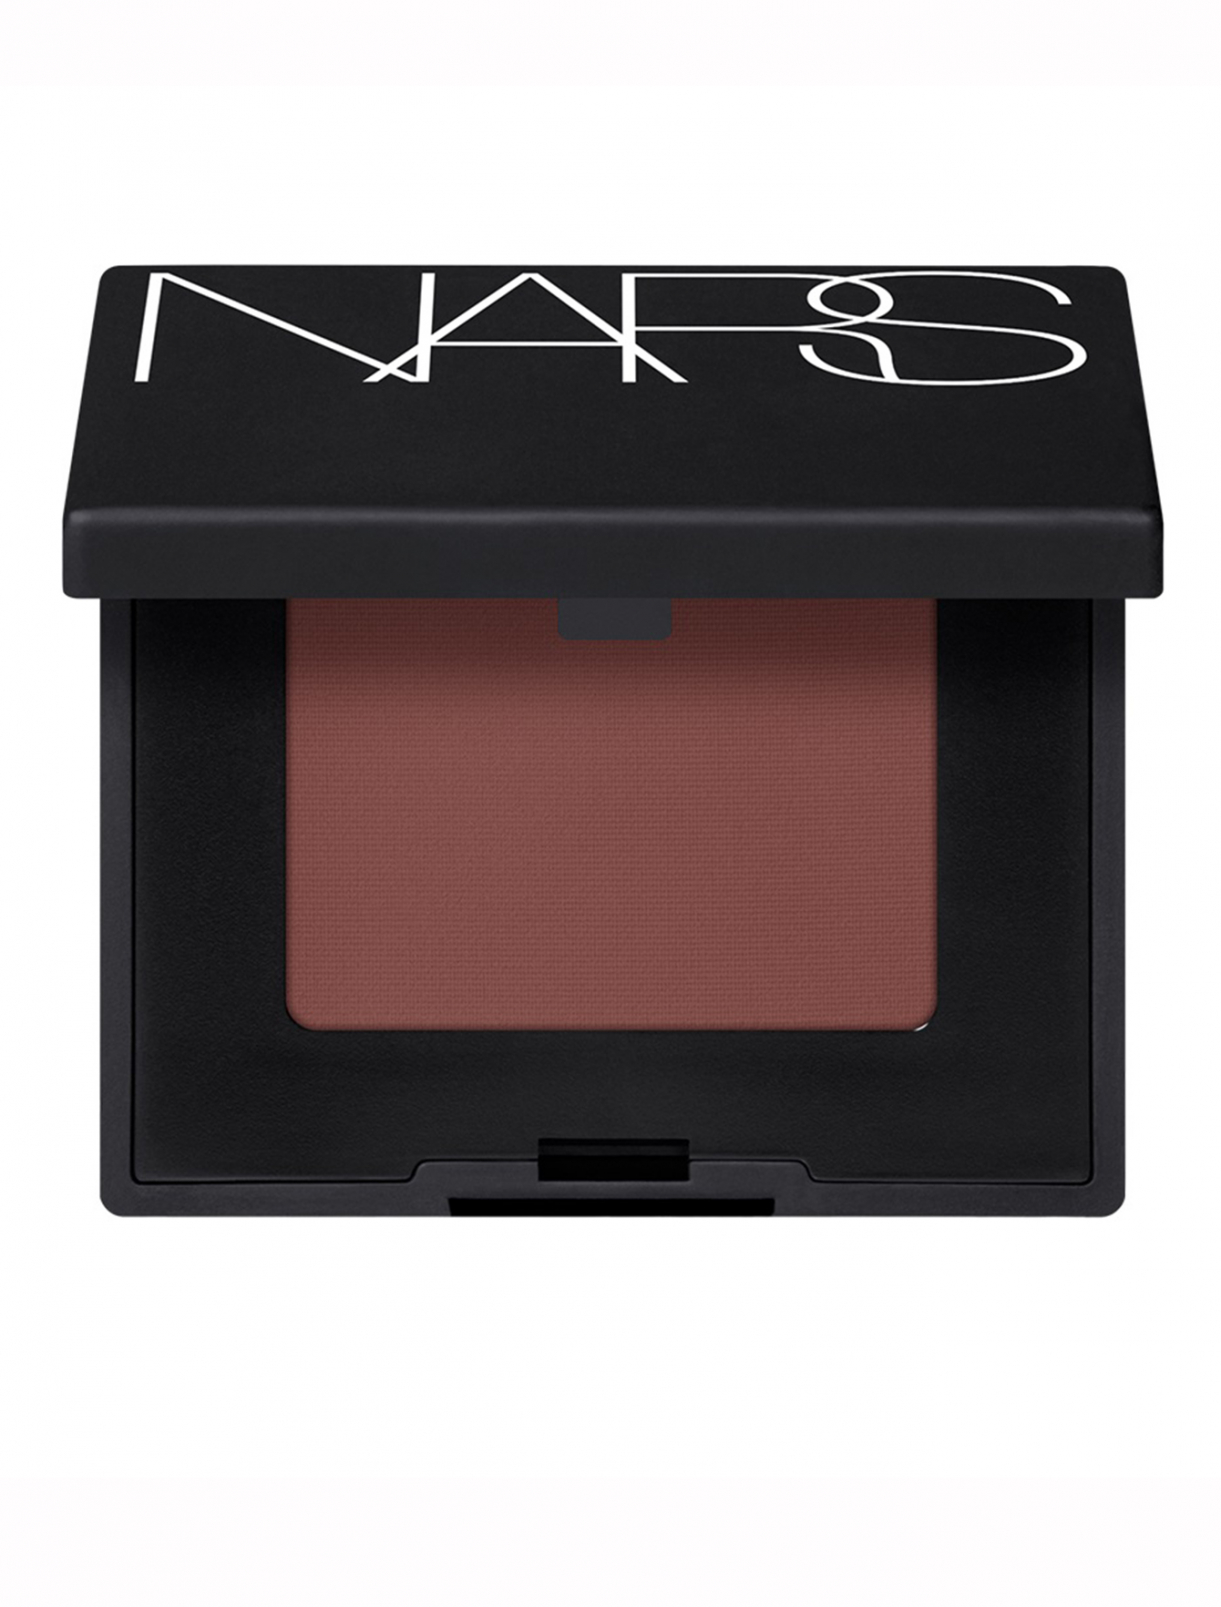 Монотени для век New York Makeup NARS  –  Общий вид